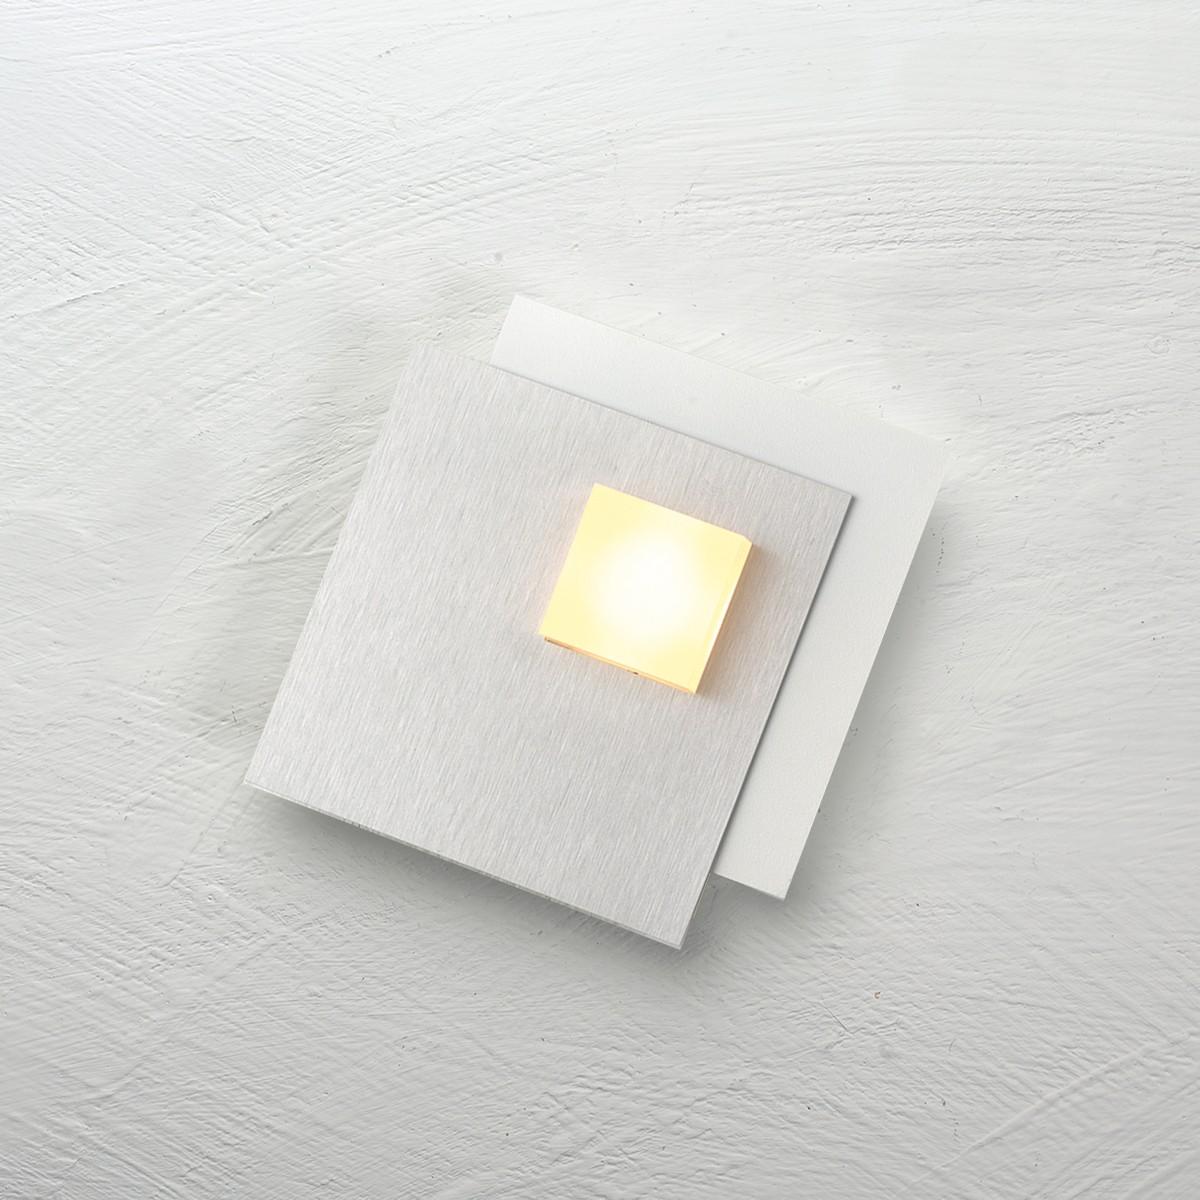 Bopp Pixel 2.0 Deckenleuchte 1-flg., weiß, Dekoplatte: Aluminium